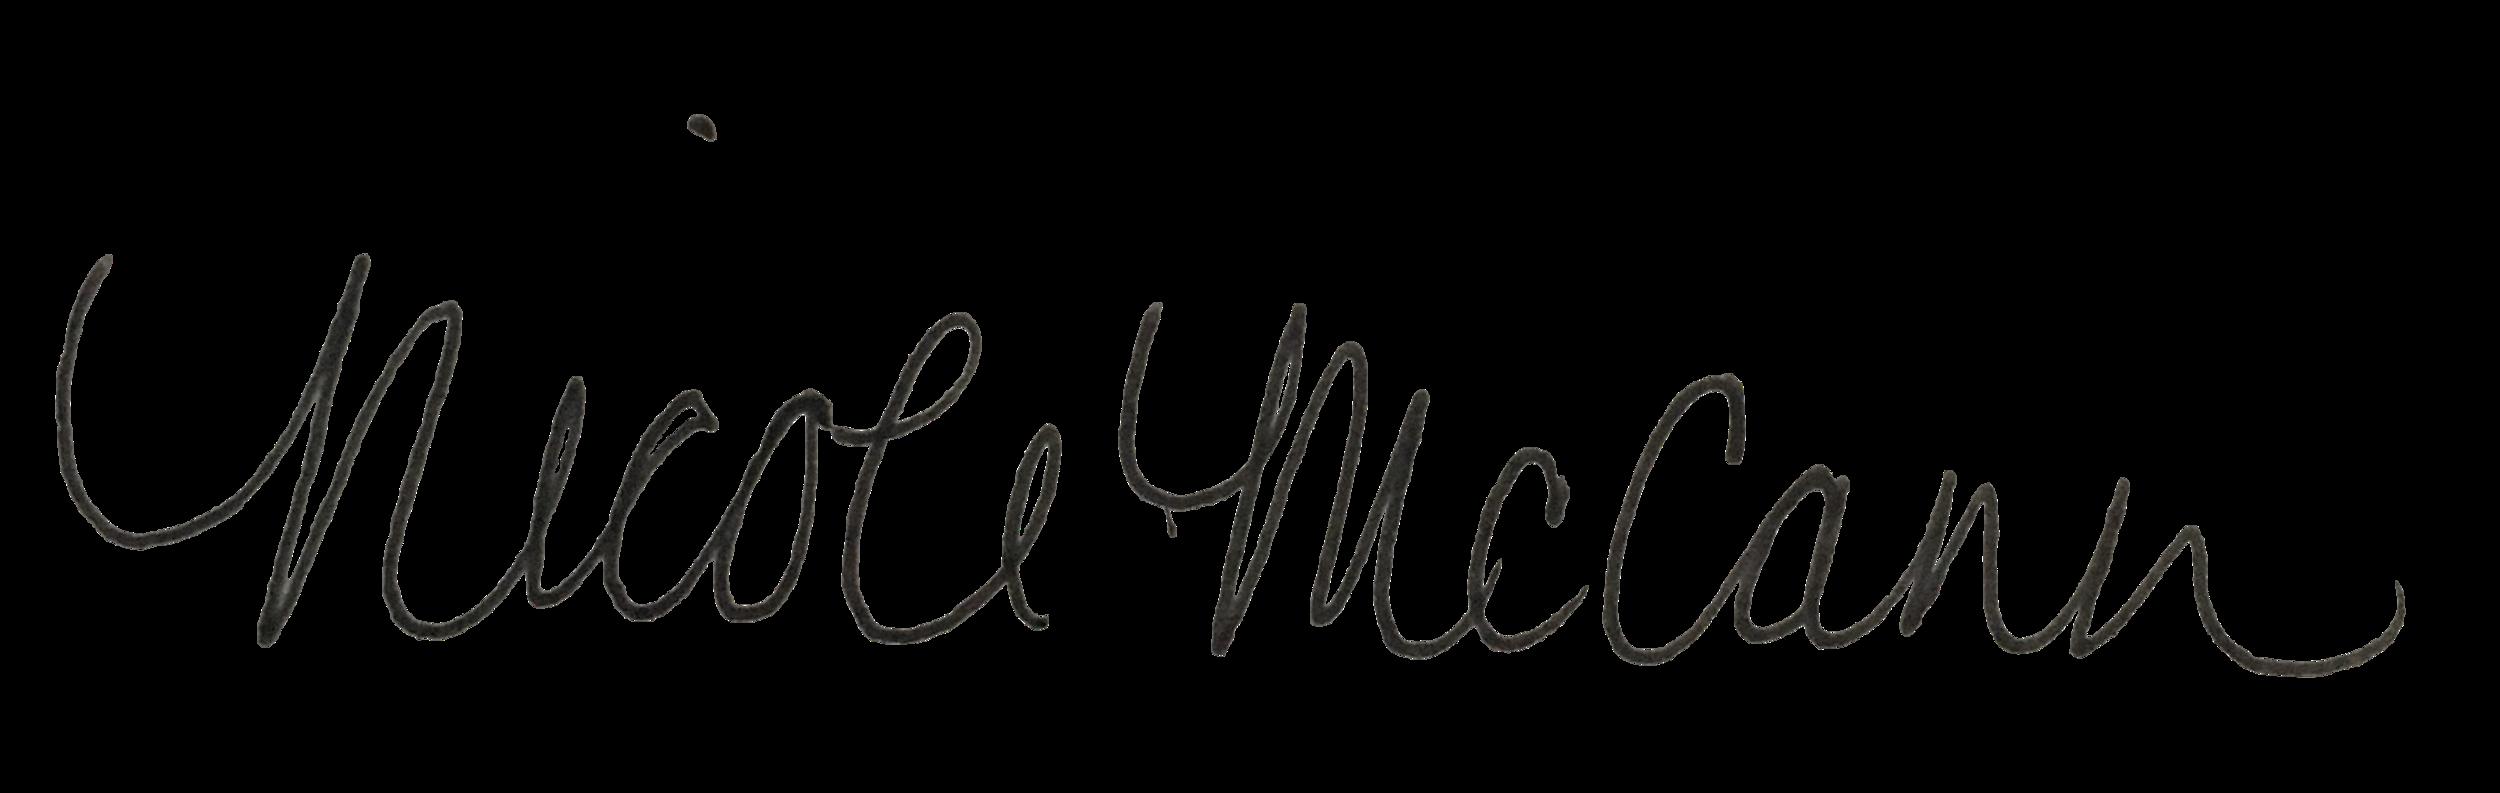 Nicole's Signature.png